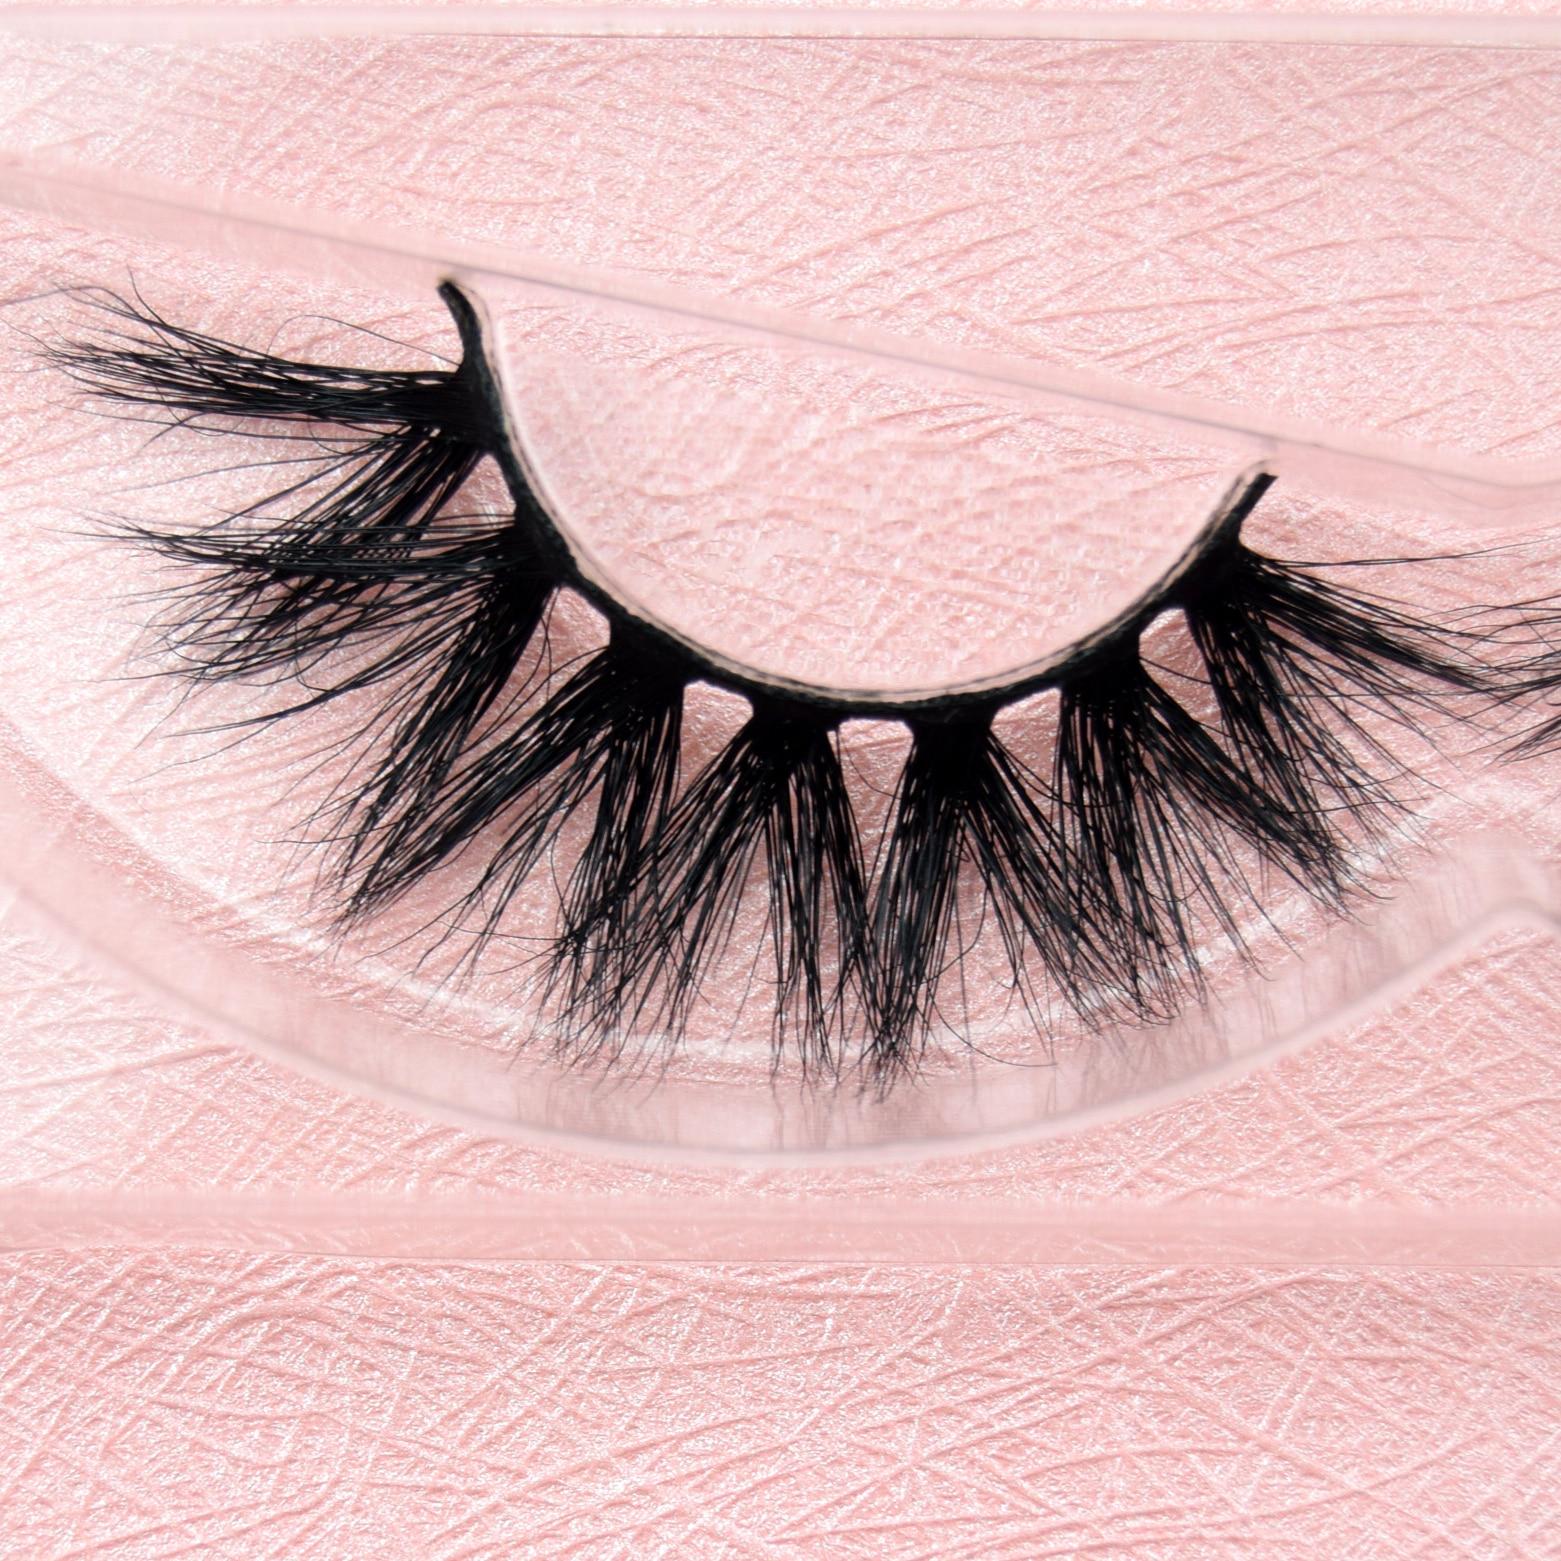 visofree 1 pair 3d mink lashes wholesale 100% real mink fur Handmade crossing lashes individual stri